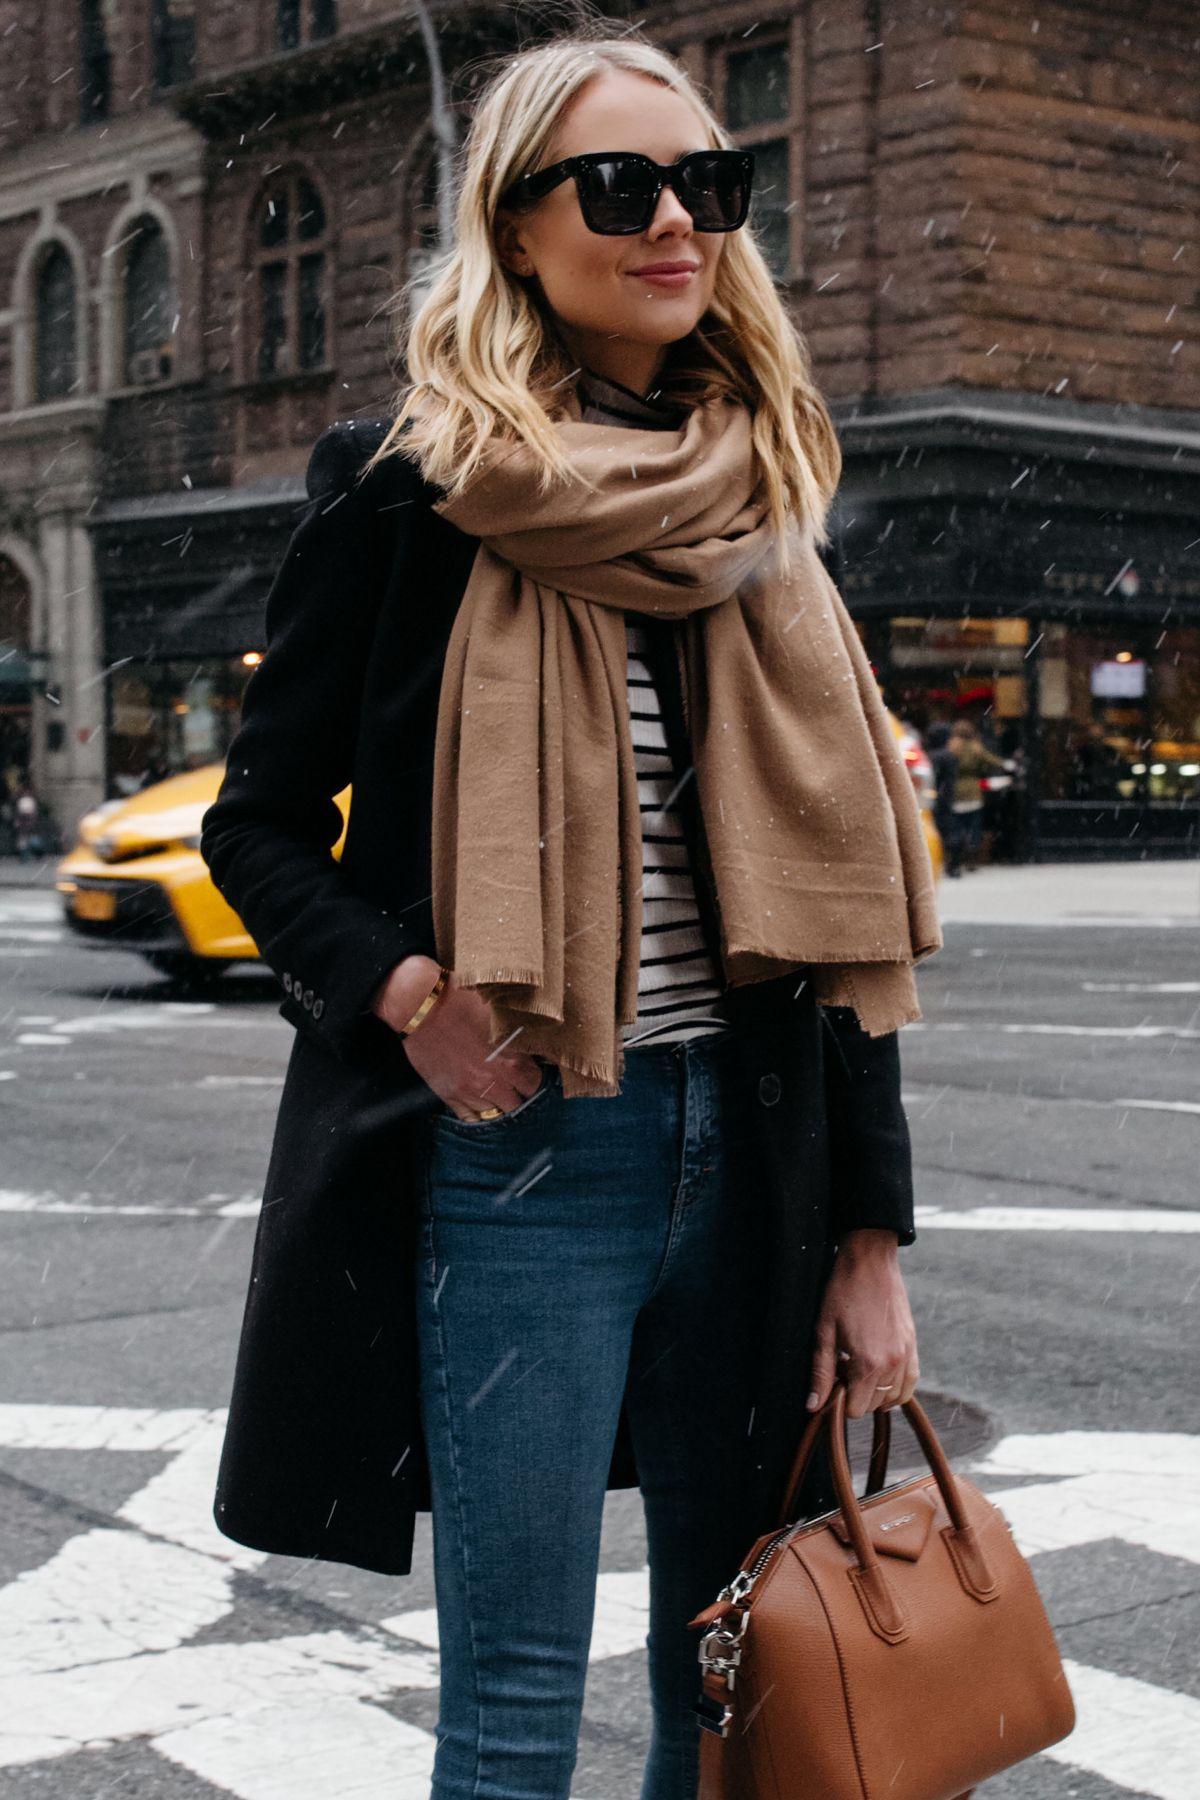 2635fcb562a7 Blonde Woman Wearing Tan Scarf Black Wool Coat Striped Top Denim Skinny  Jeans Givenchy Antigona Satchel Fashion Jackson Dallas Blogger Fashion  Blogger ...